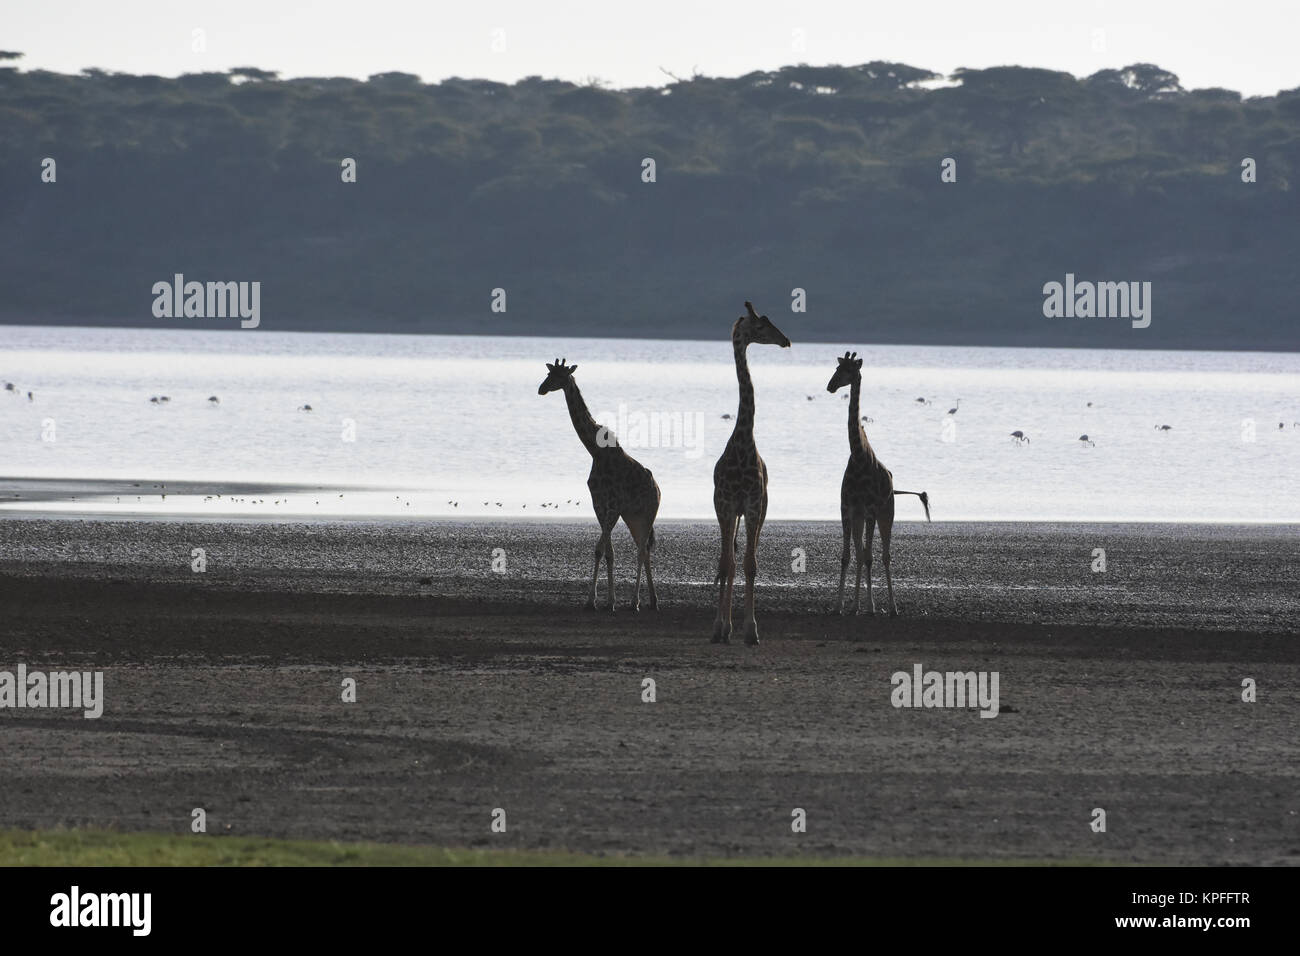 Wildlife sightseeing in one of the prime wildlife destinations on earth -- Serengeti, Tanzania. Giraffe silhouette - Stock Image